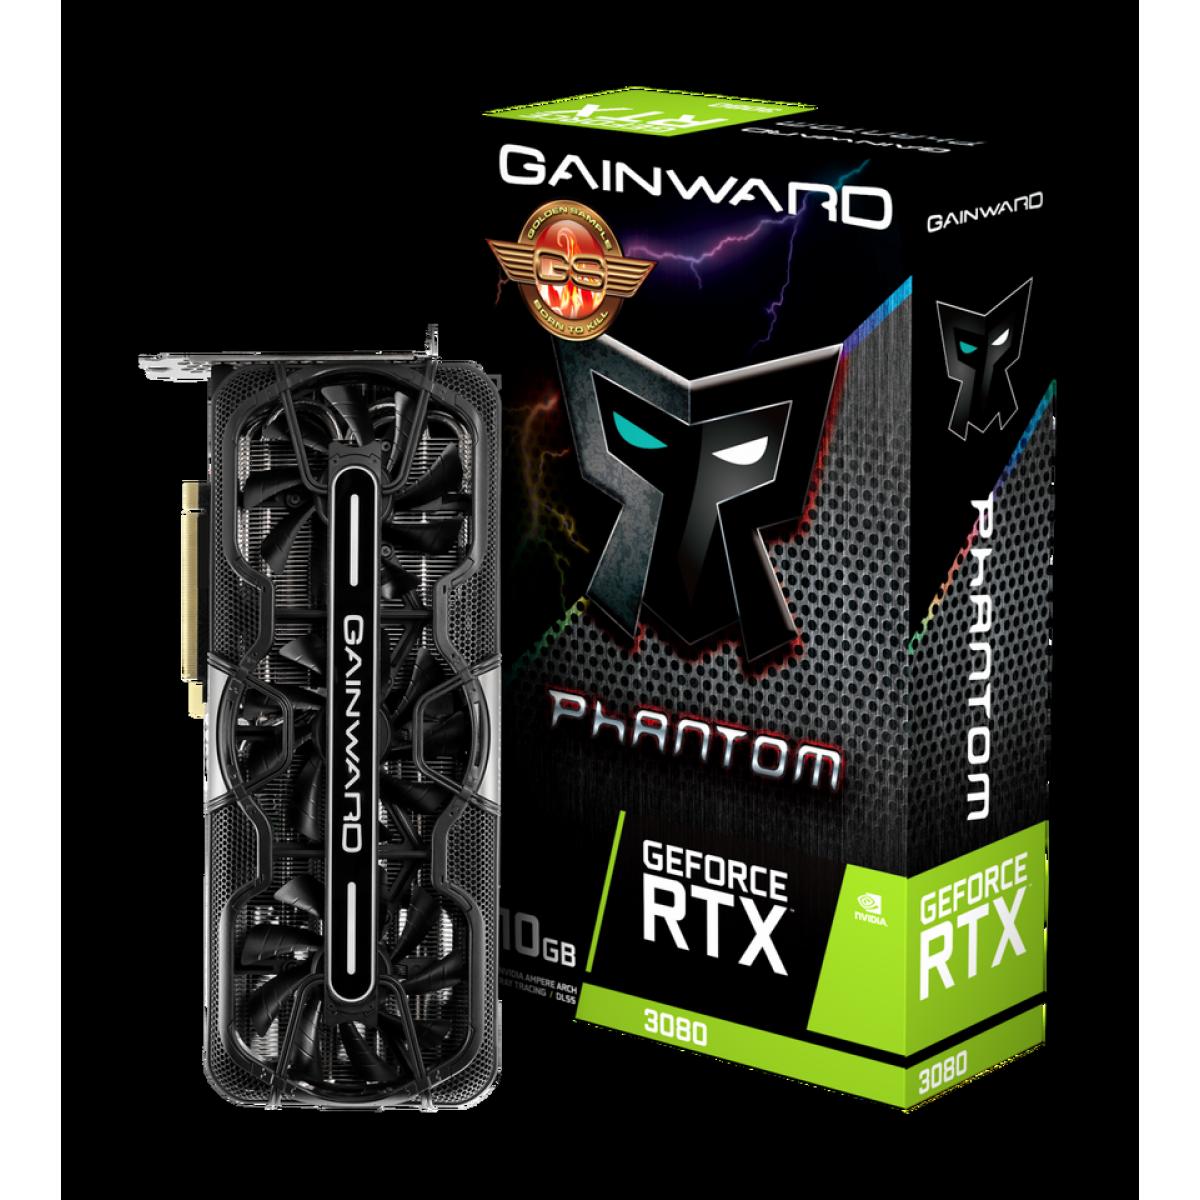 Placa de Vídeo Gainward, GeForce RTX 3080 Phantom GS, 10GB, GDDR6, 320Bit, NED3080H19IA-1020P